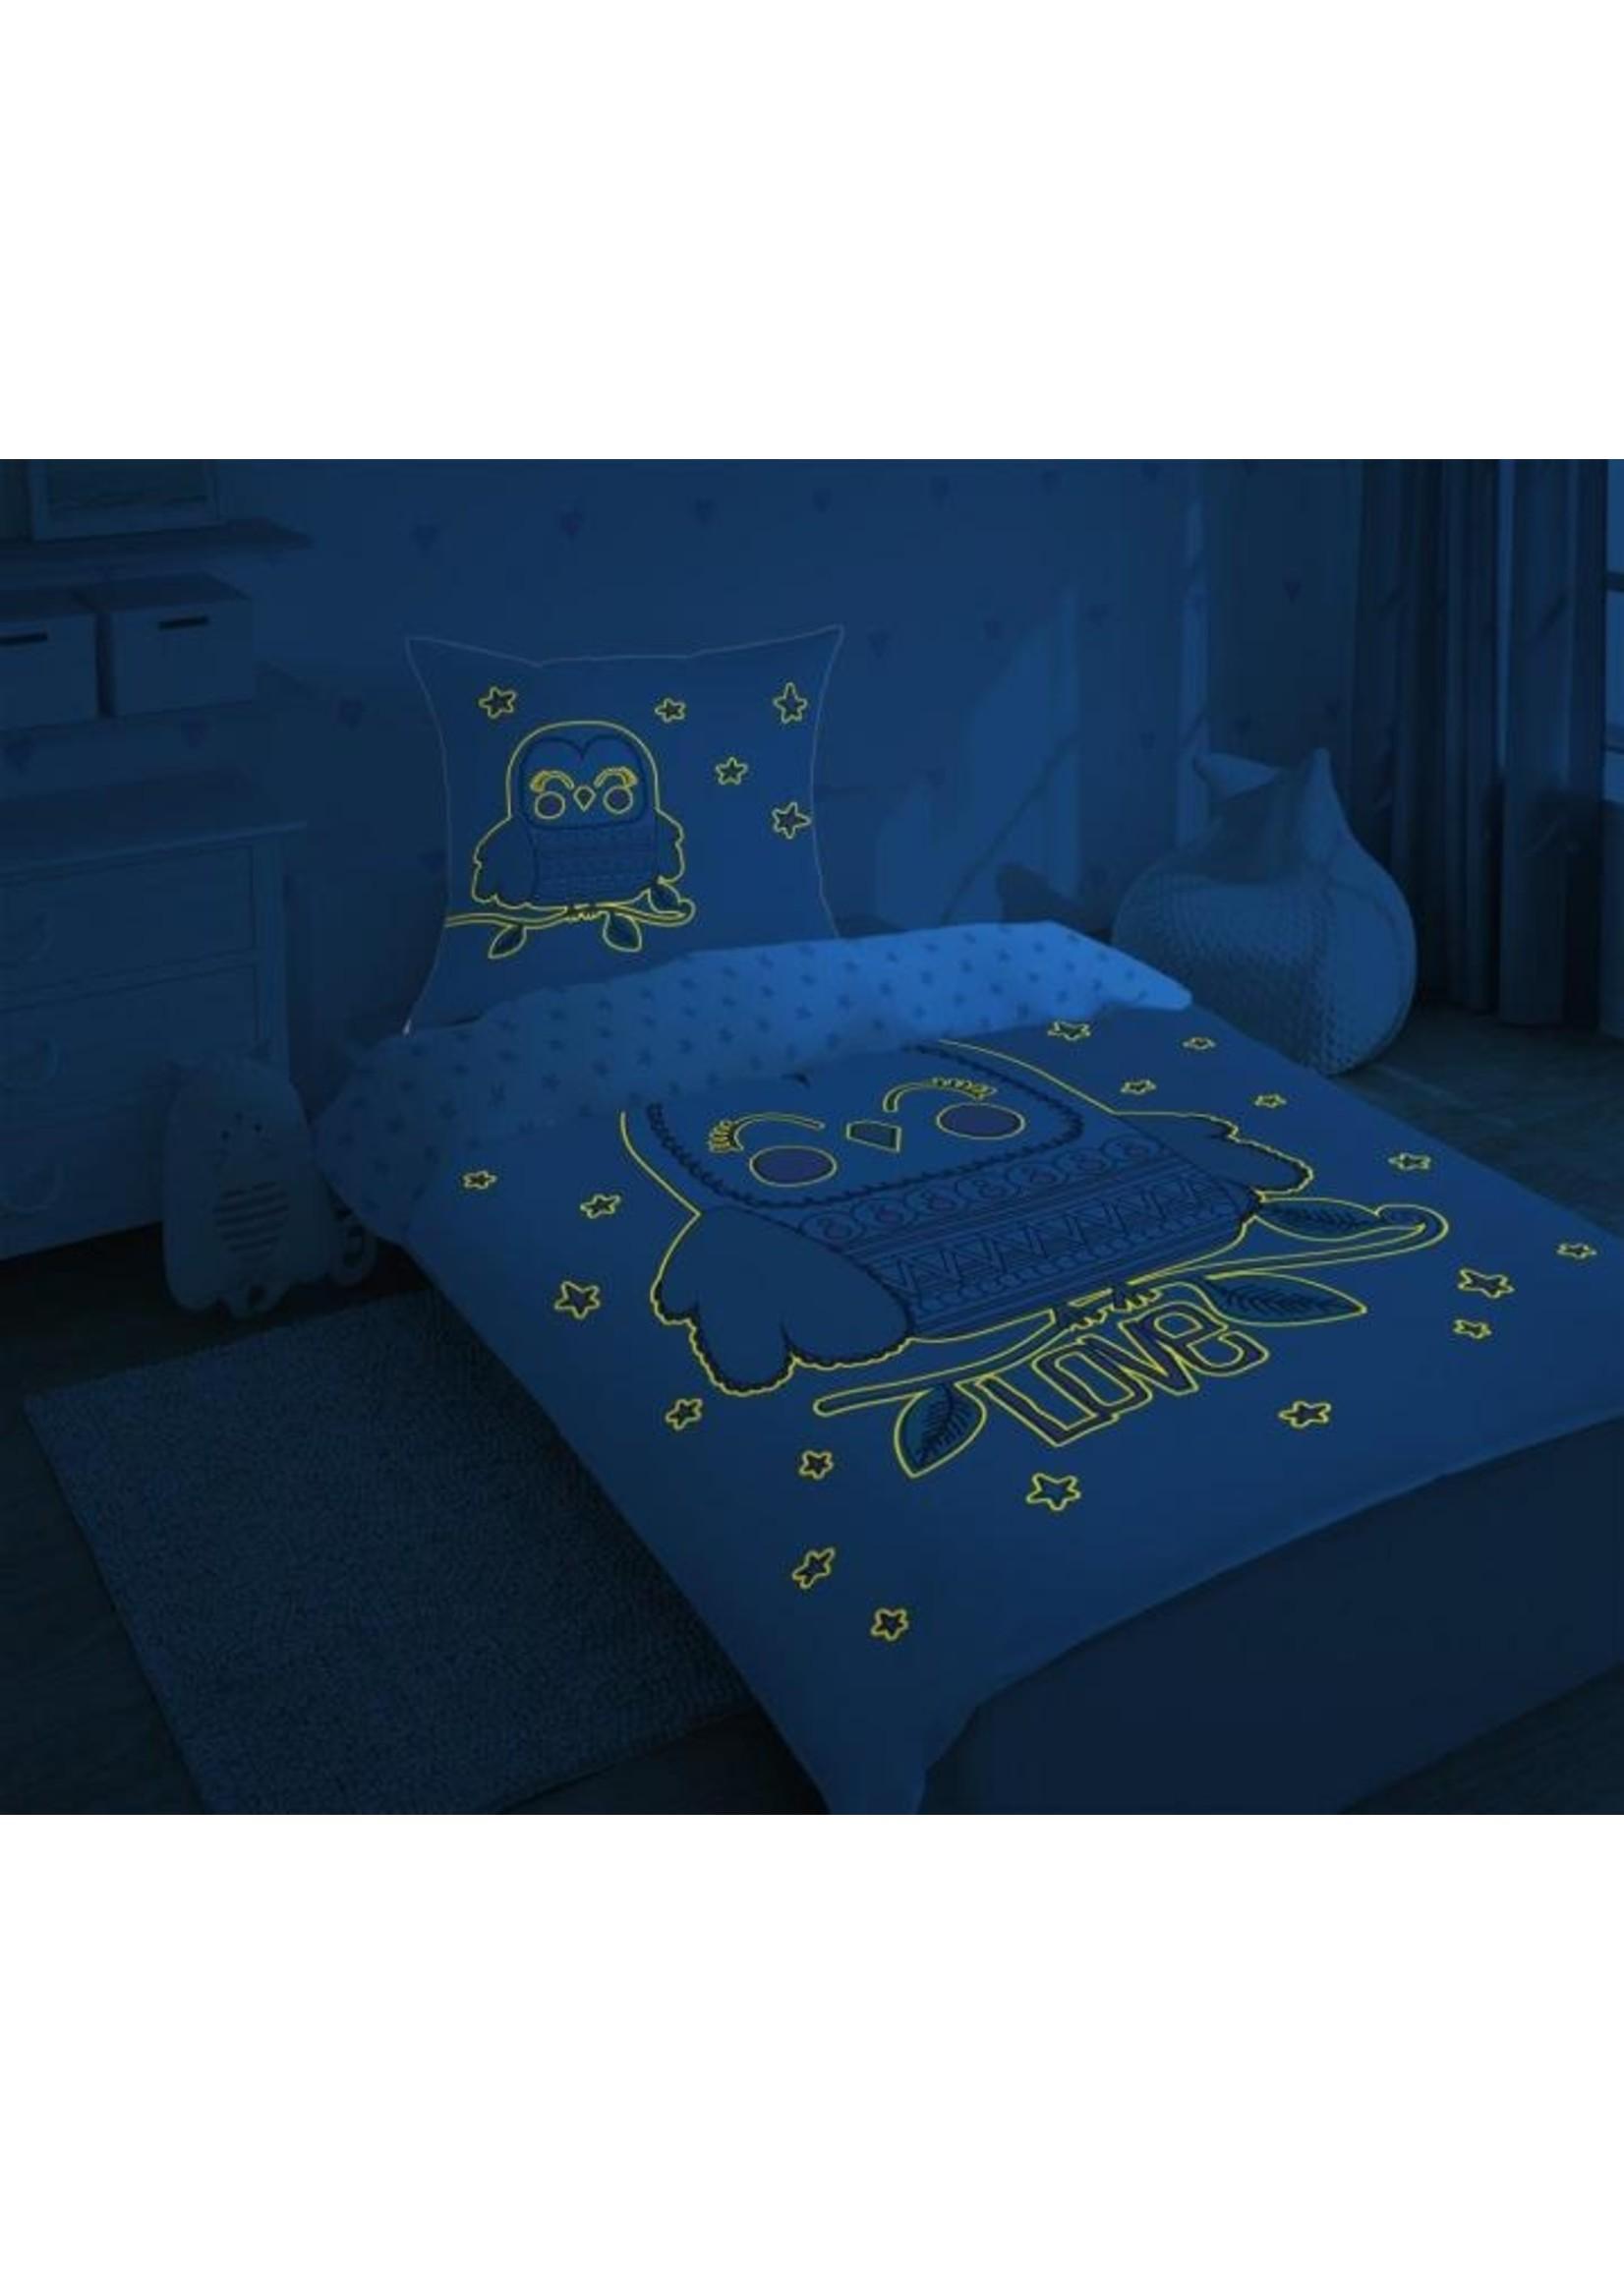 Uil LOVE dekbedovertrek Glow in the Dark